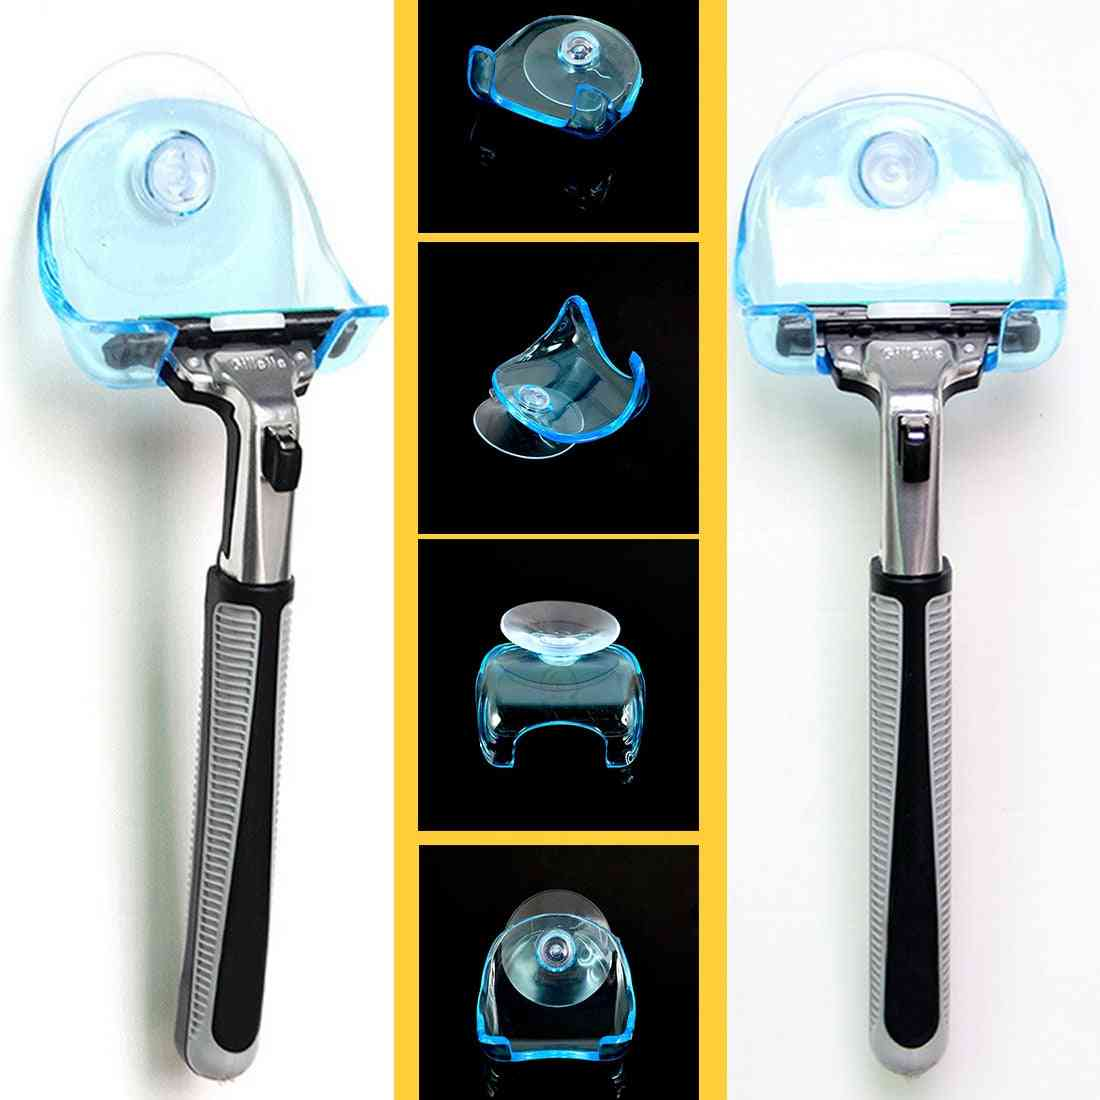 1pcs Clear Plastic Super Suction Cup Razor Rack For Bathroom